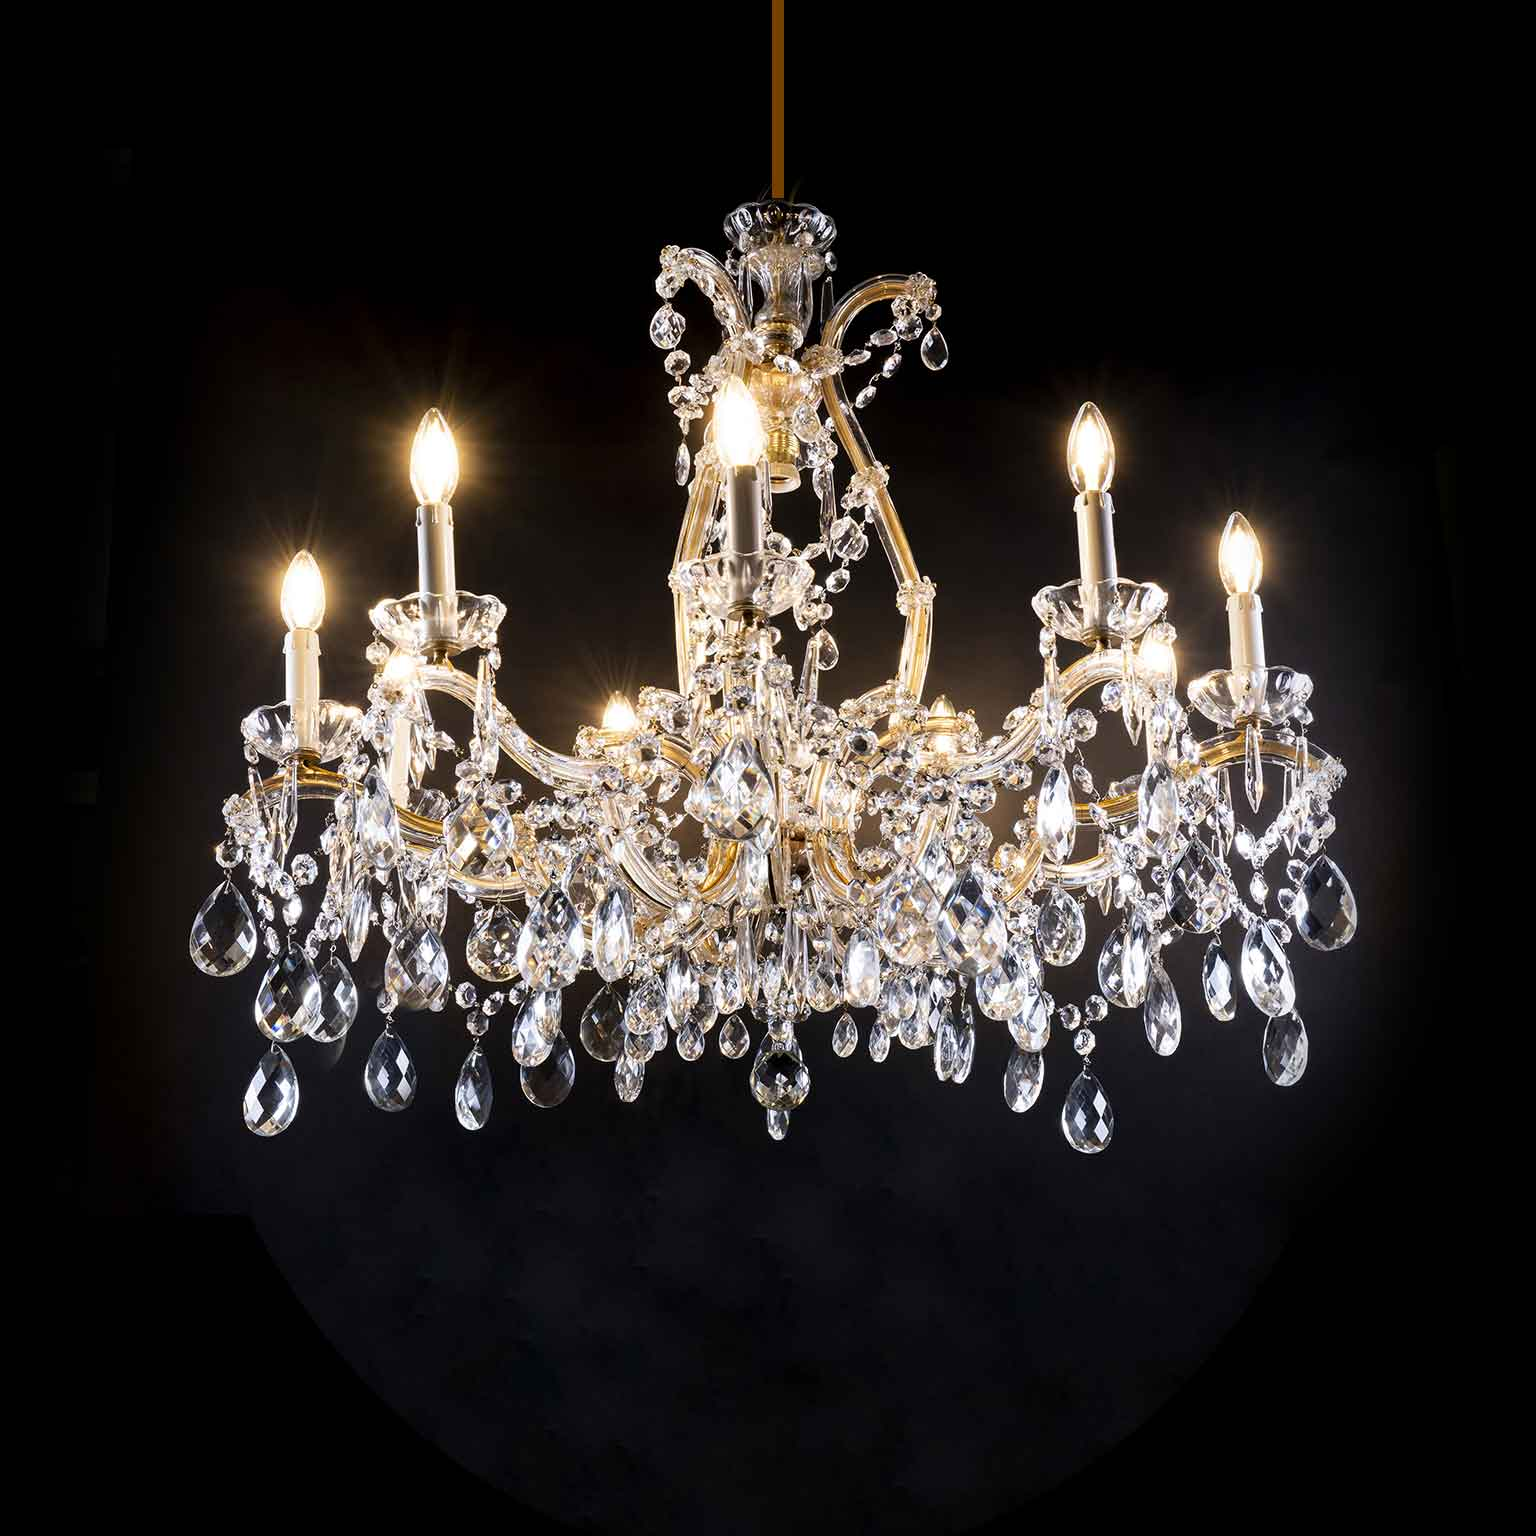 115187 cristal bohemian light ctrystal chandelier 6 luci. Lampadario In Cristallo Di Bohemia Maria Teresa 10 Luci